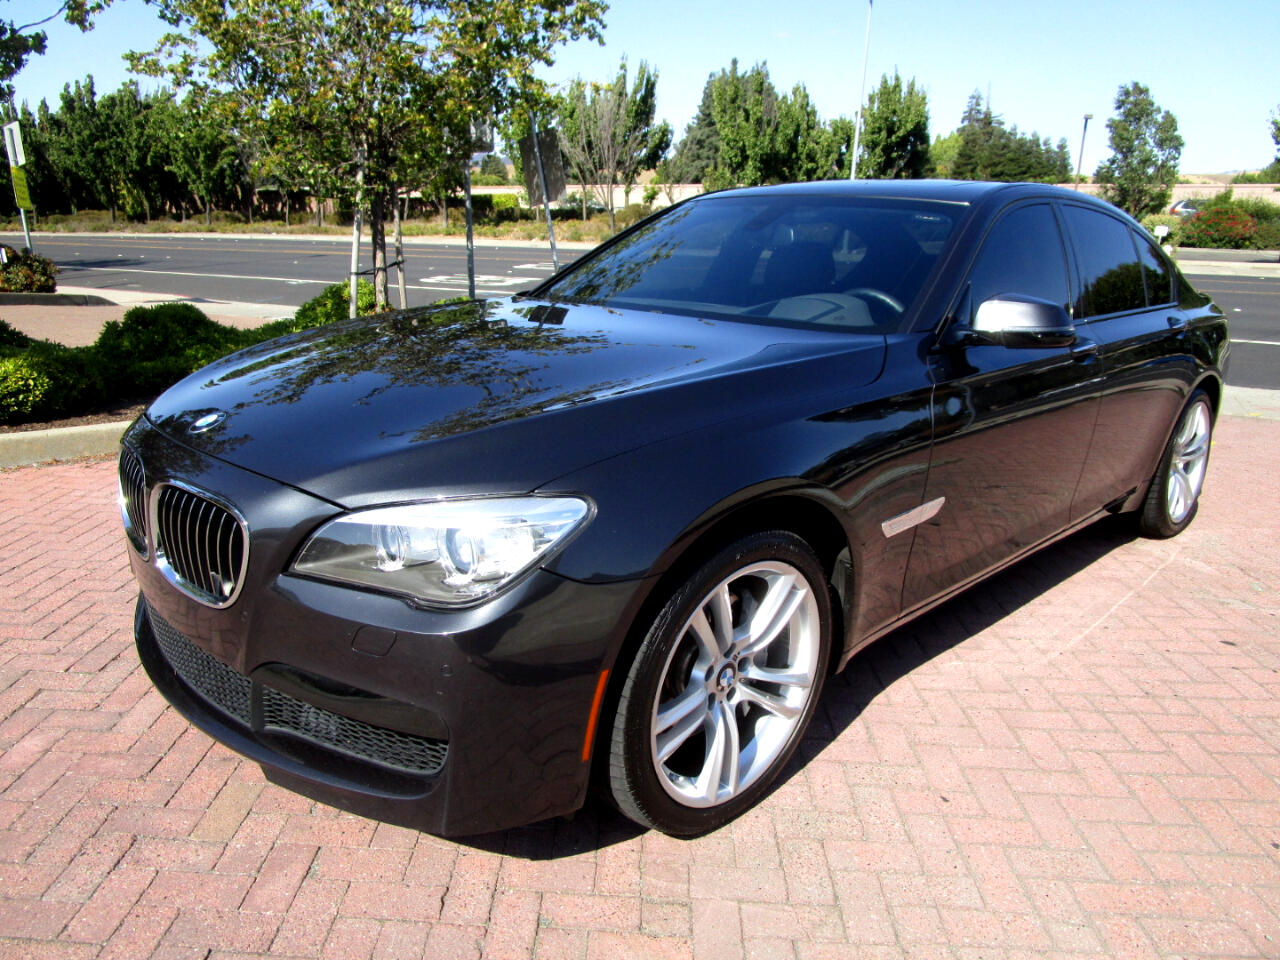 2015 BMW 740i M SPORT-PREM PKG*HEAT/AC SEATS*HEADS-UP*HK SOUND*